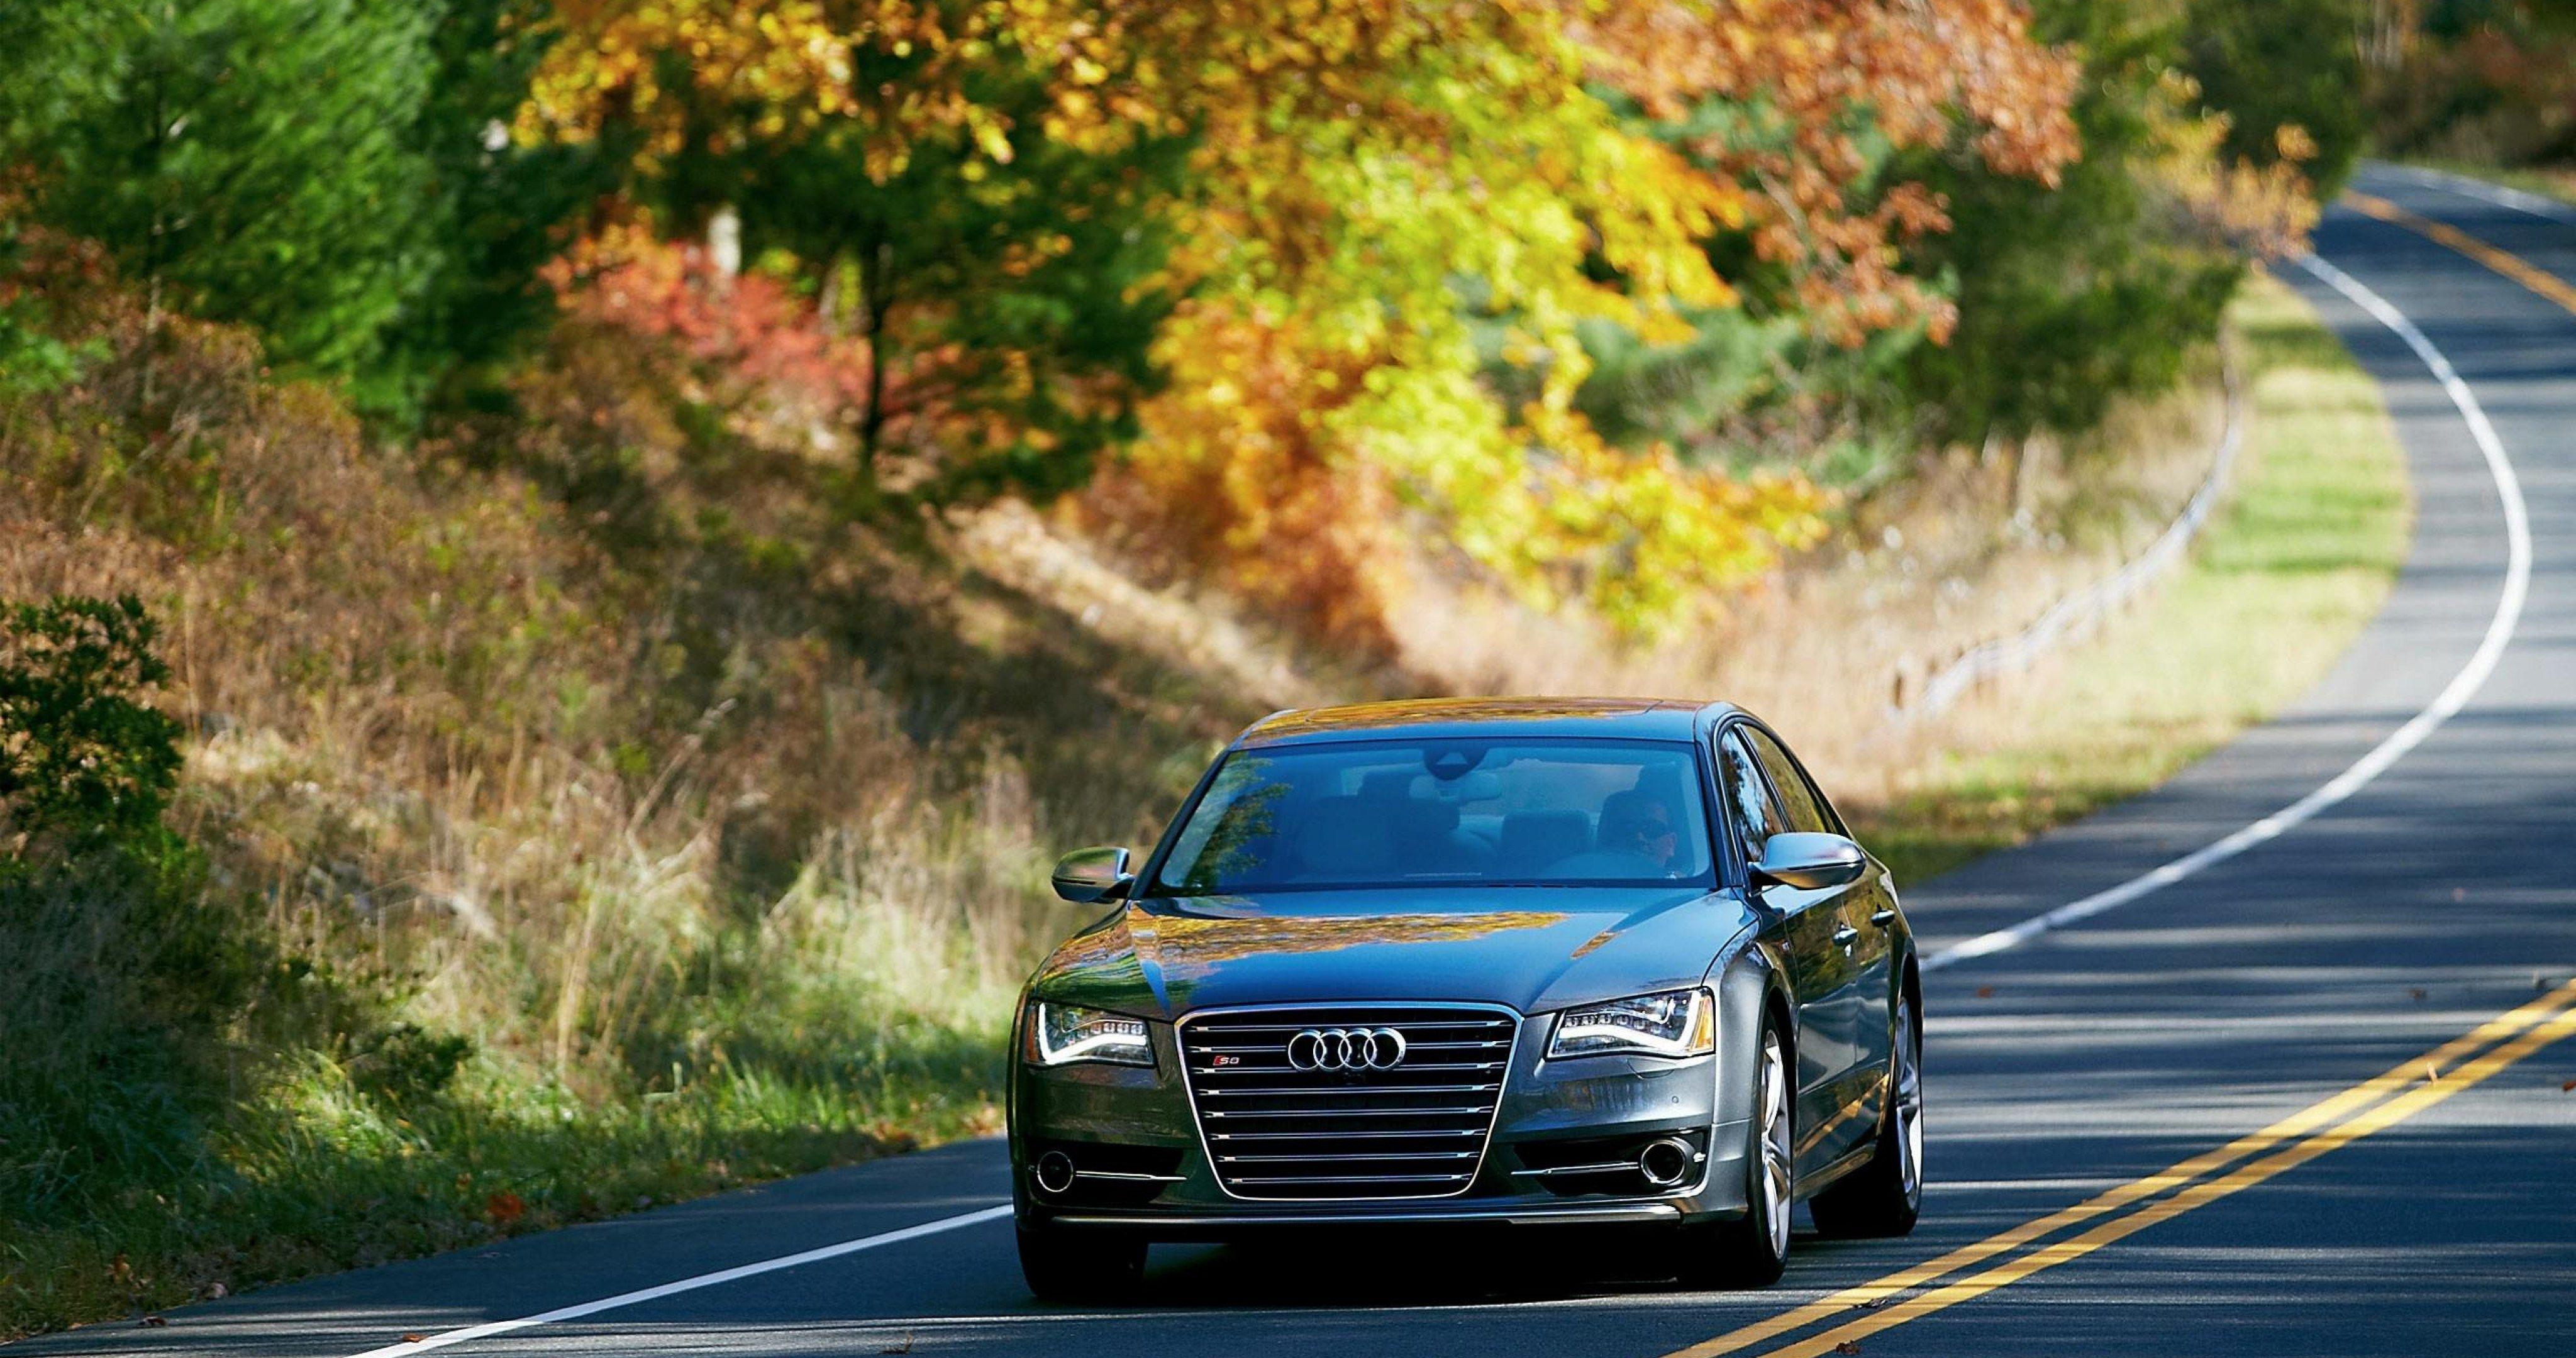 Audi S8 Car Sedan 4k Ultra Hd Wallpaper Hd Wallpaper Pinterest